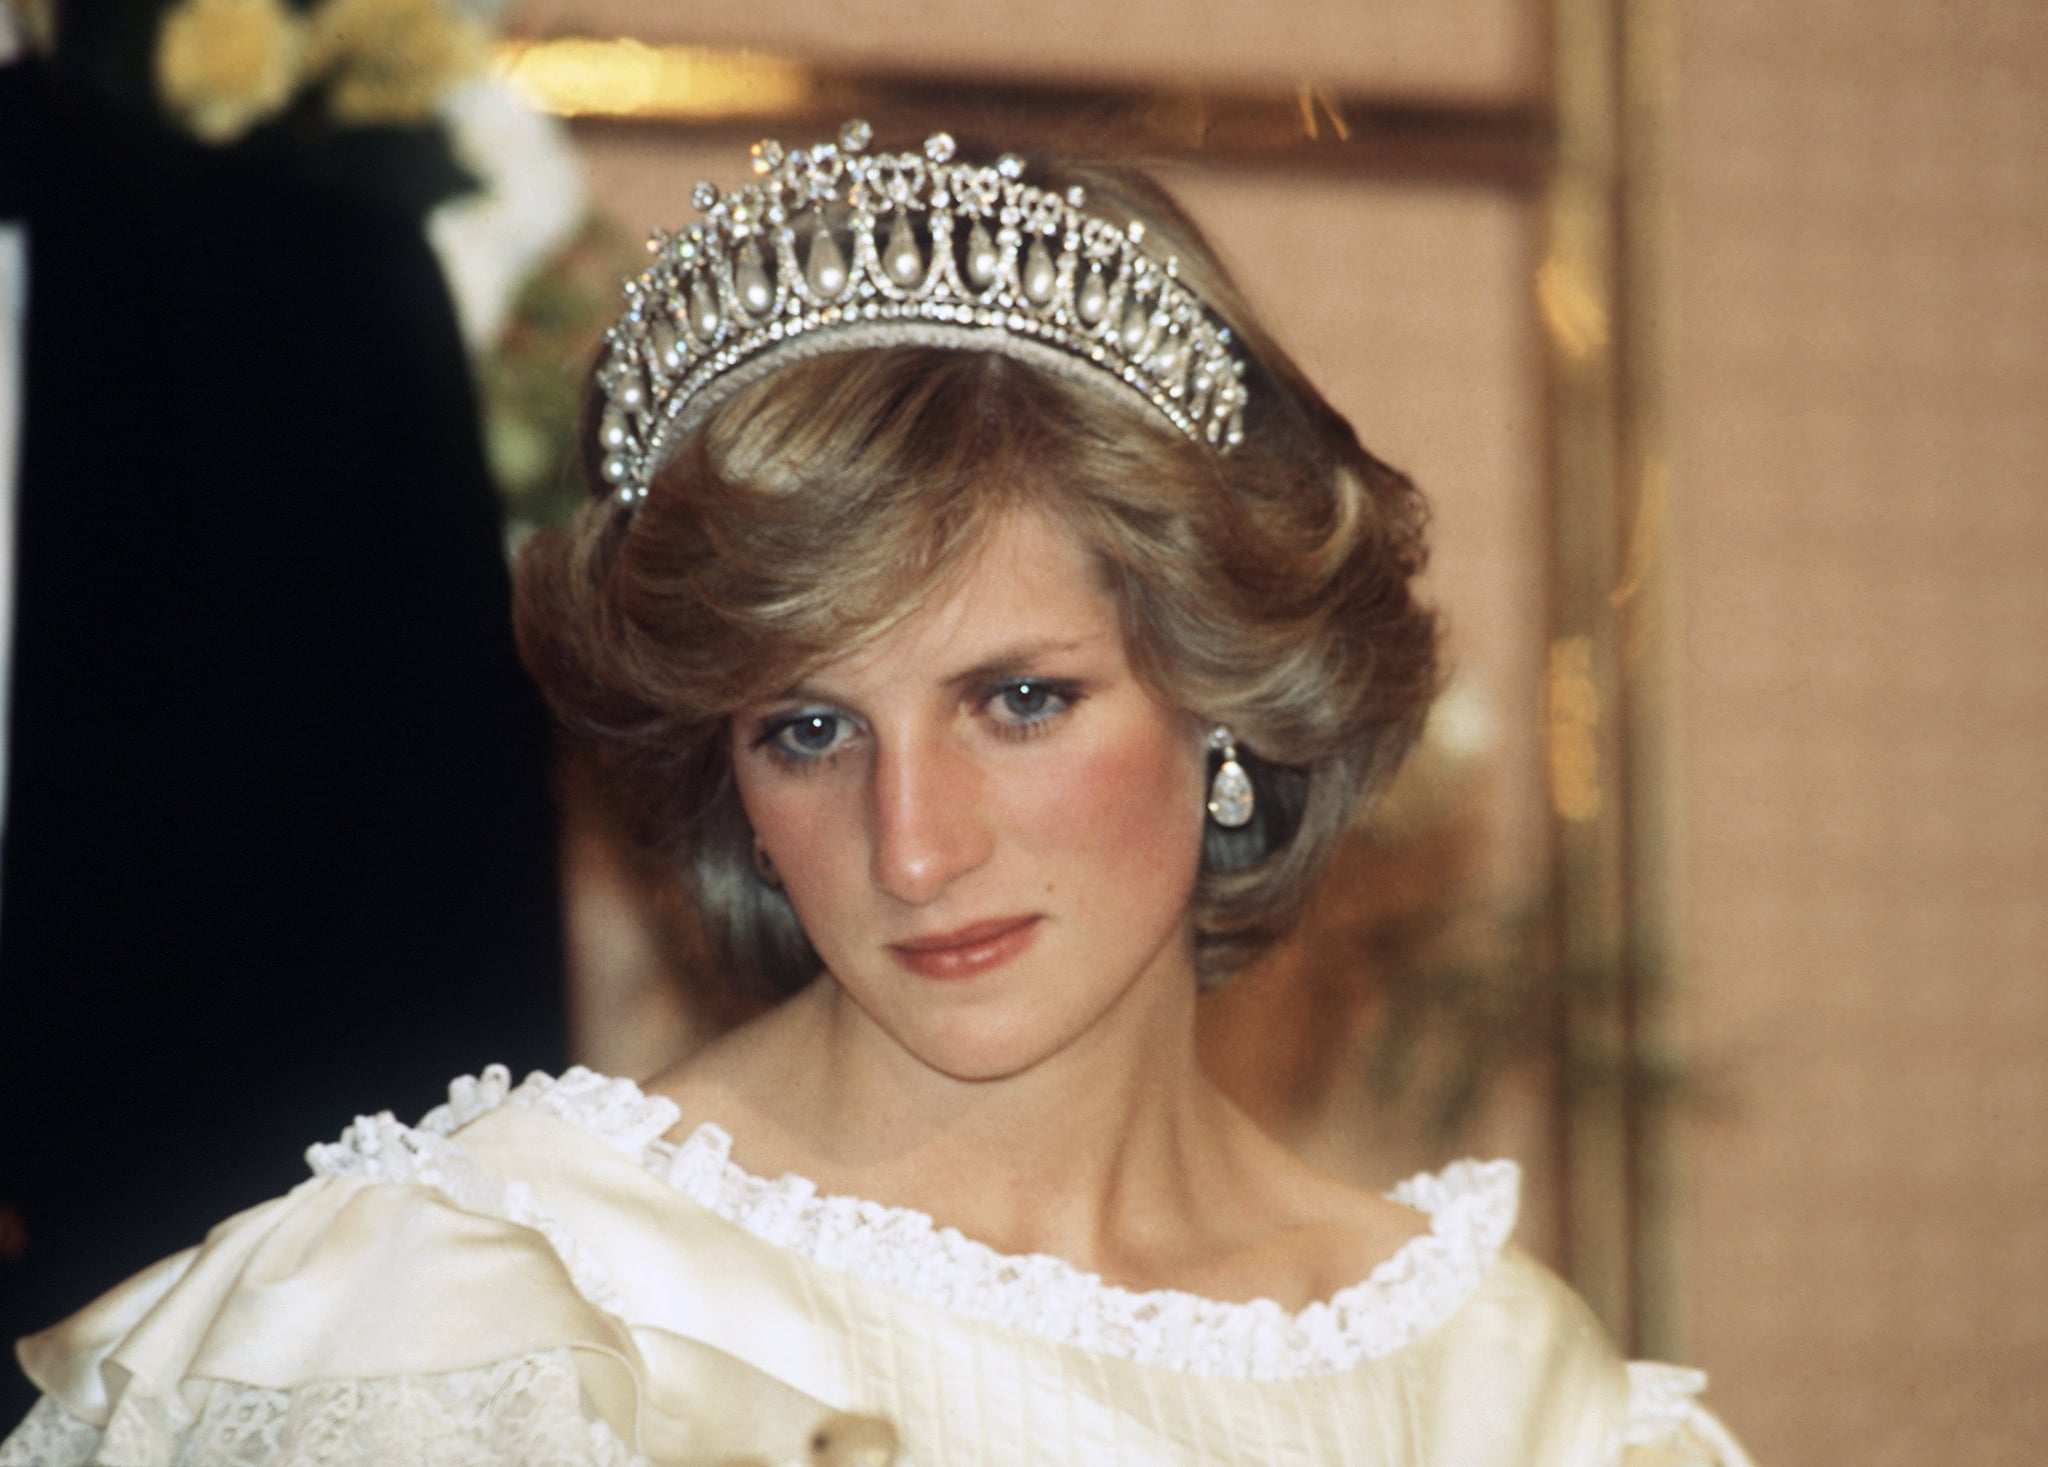 The Cambridge Lover 39 S Knot Tiara A Look Back At Princess